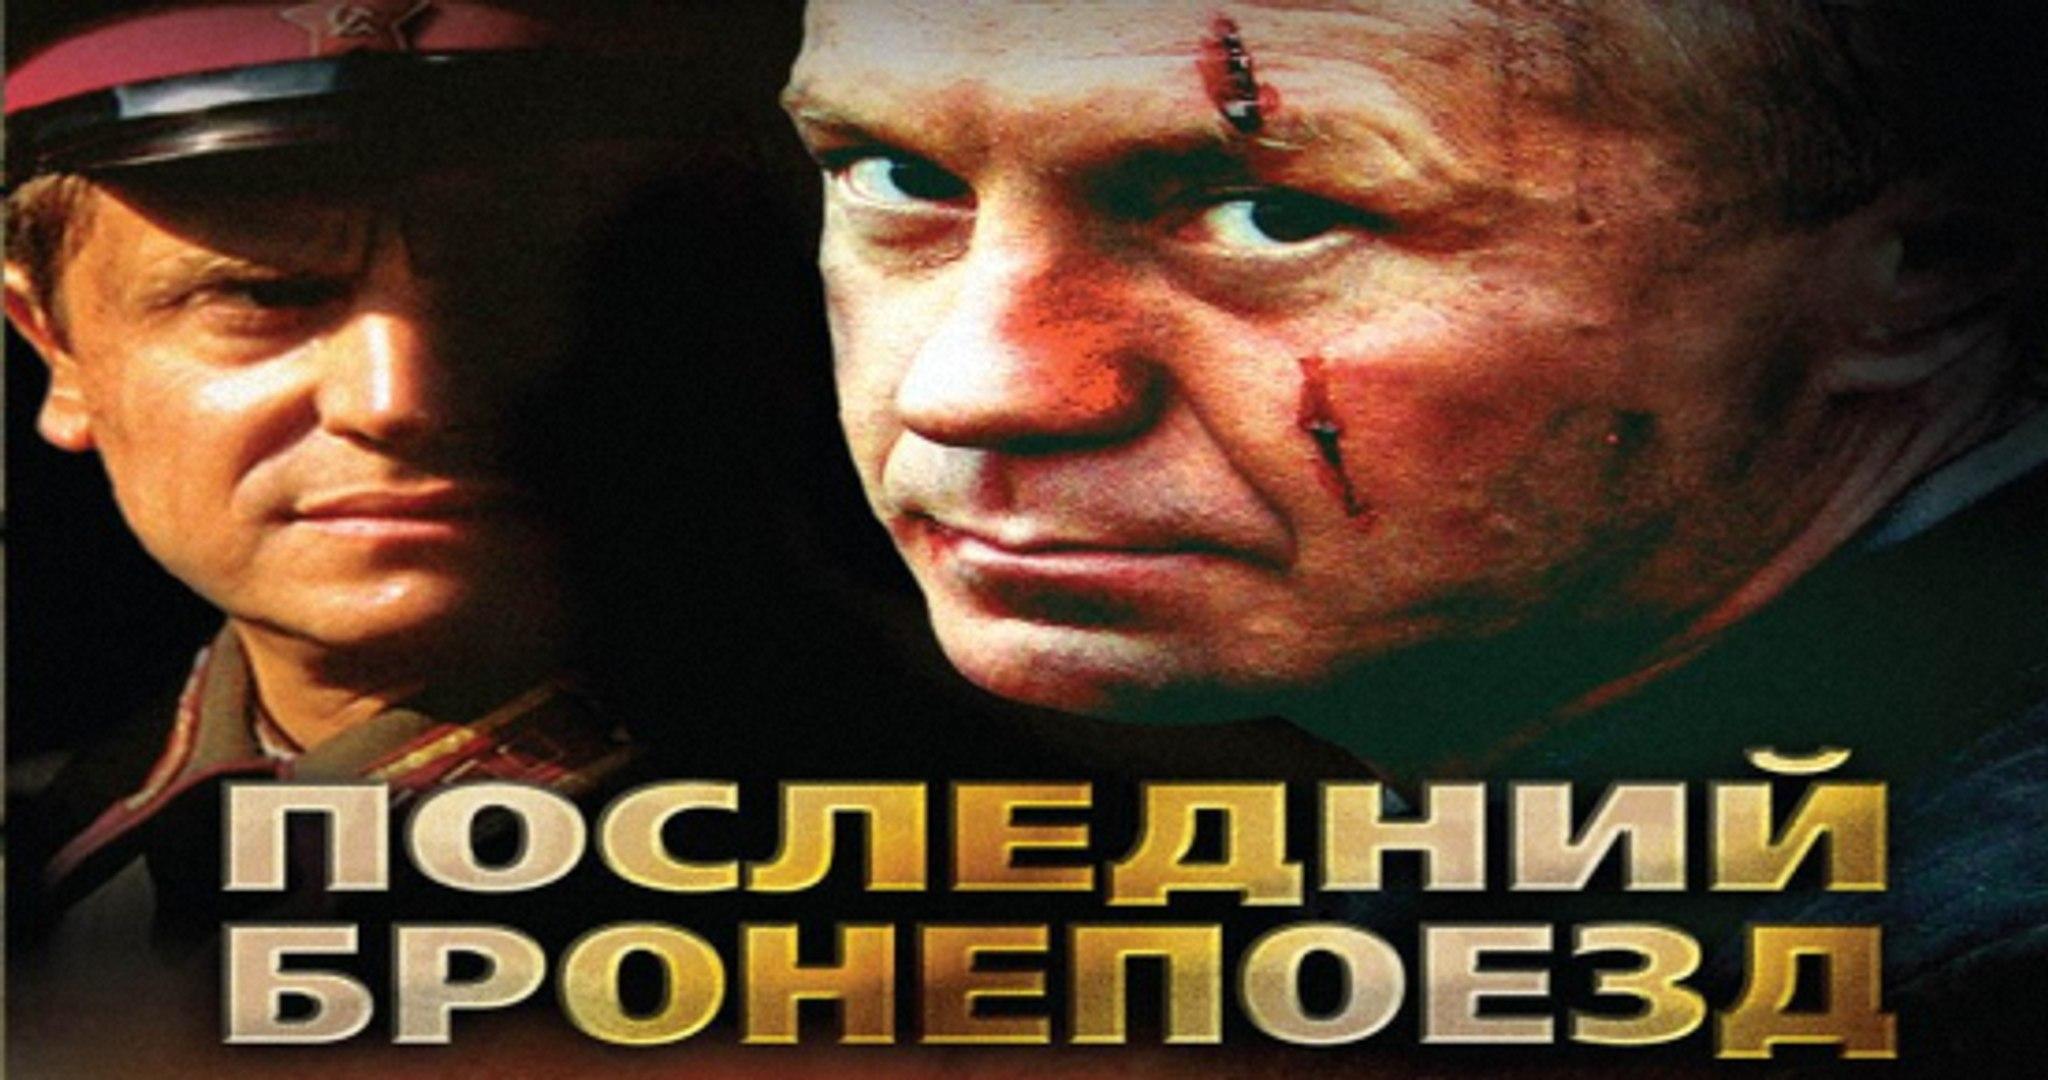 Последний бронепоезд. 2 серия  (2006)